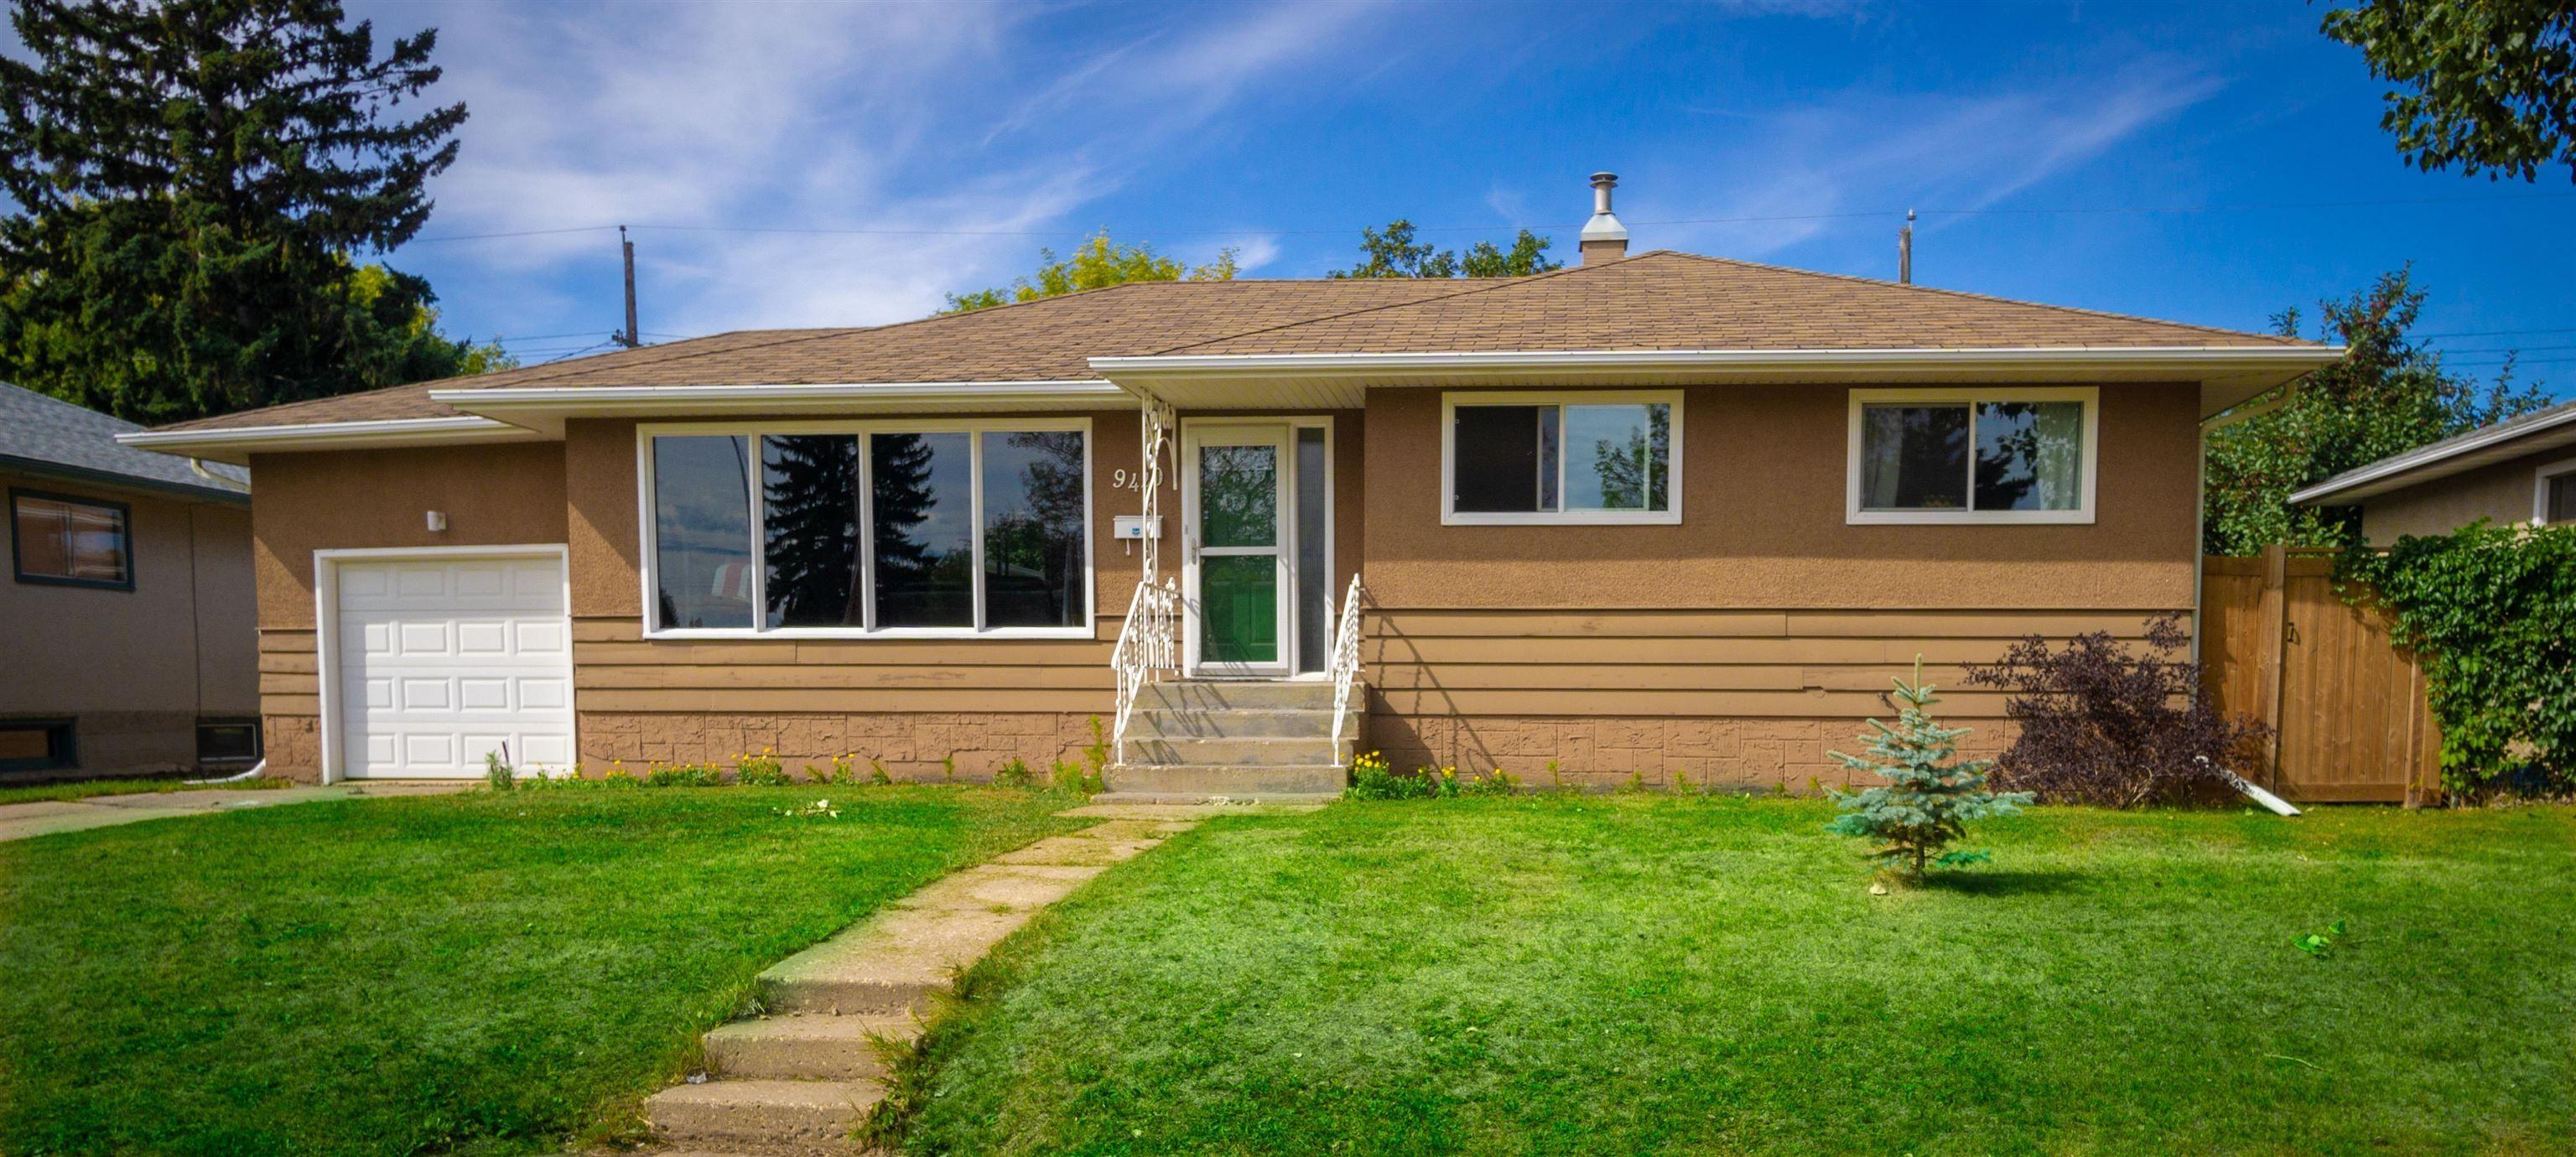 Main Photo: 9440 75 Street in Edmonton: Zone 18 House for sale : MLS®# E4261190